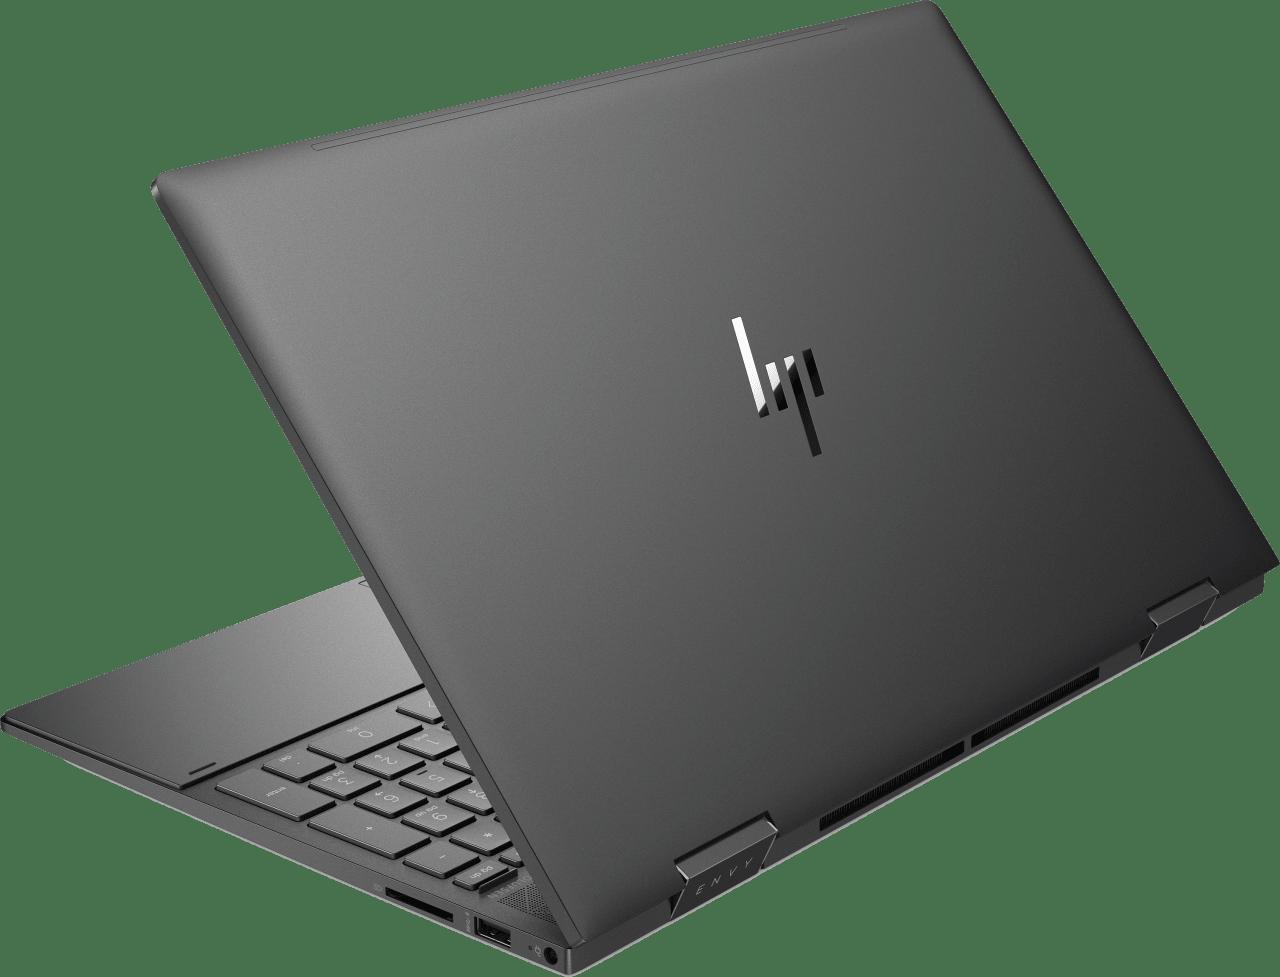 Nightfall Black HP Envy x360 15-ee0265ng 2in1 - AMD Ryzen™ 7 4700U - 8GB - 512GB PCIe - AMD Radeon Vega Graphics.4